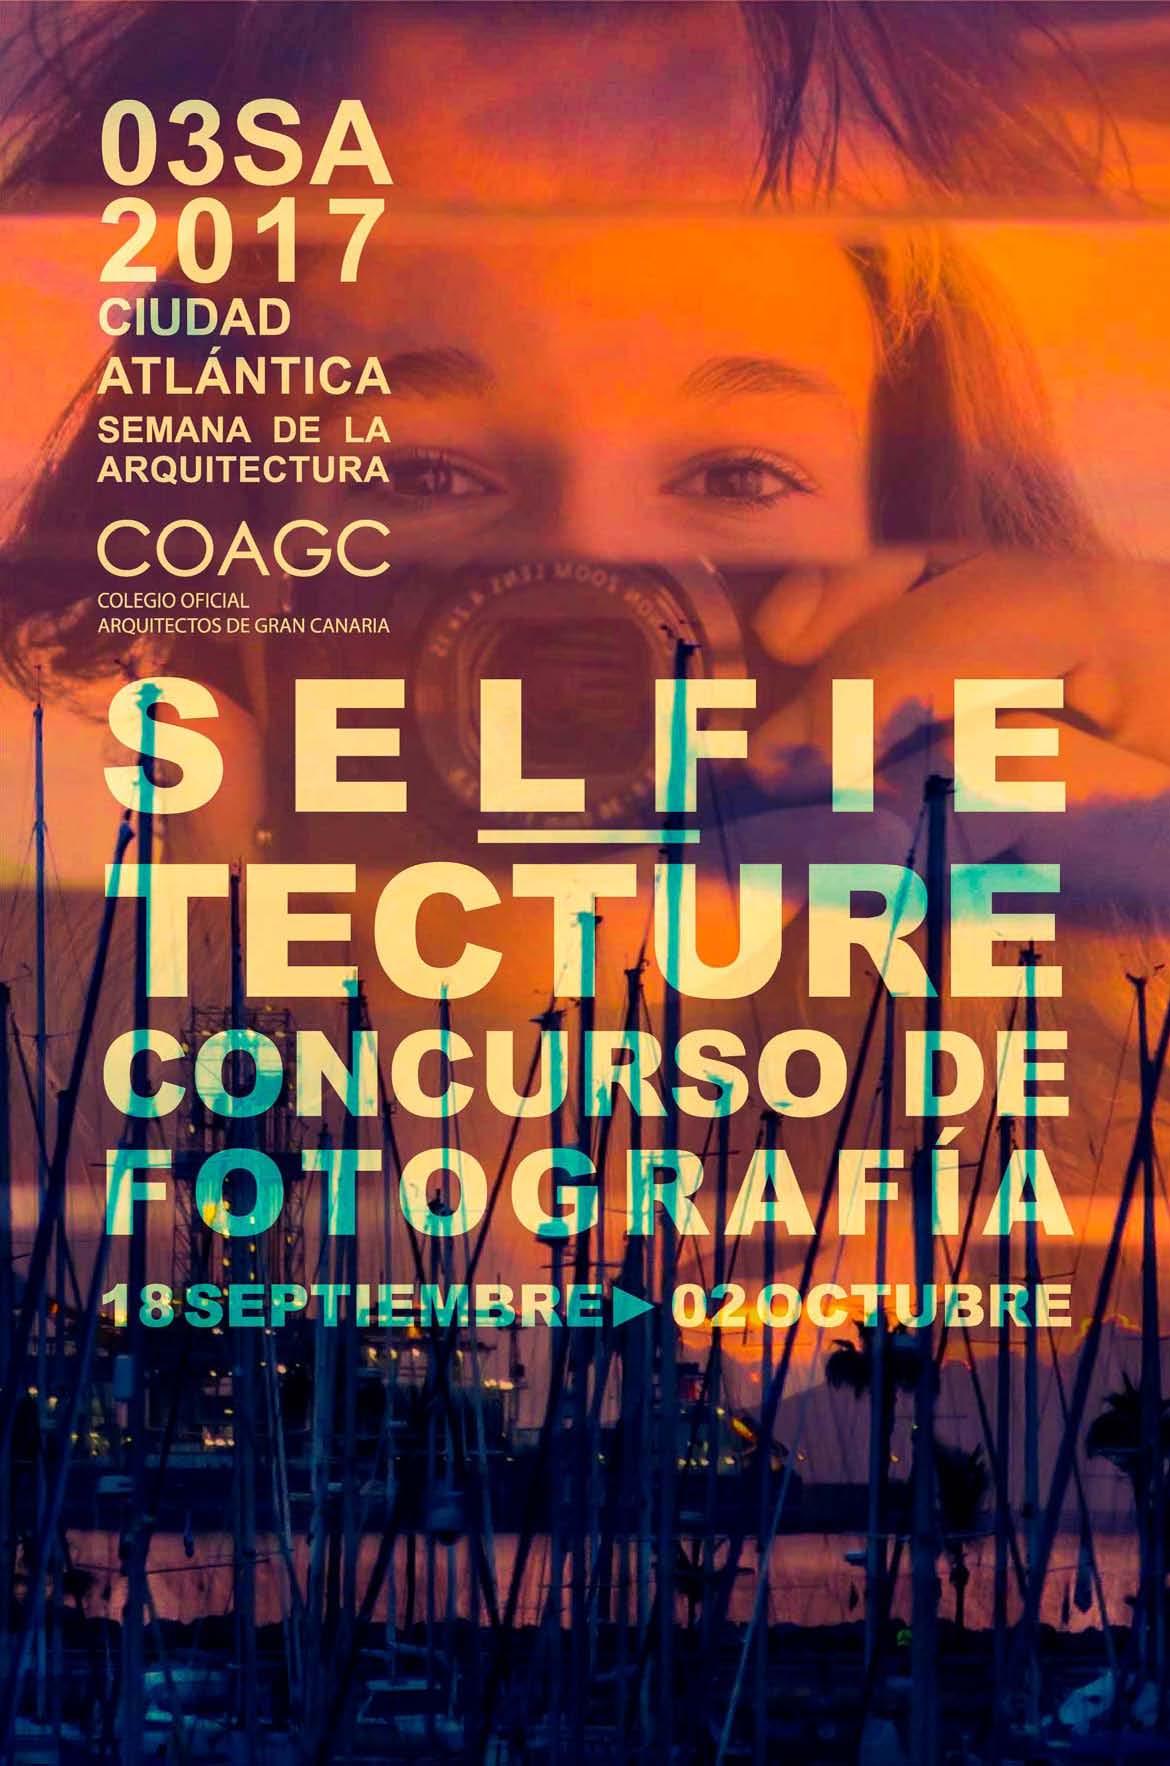 Selfie/Tecture